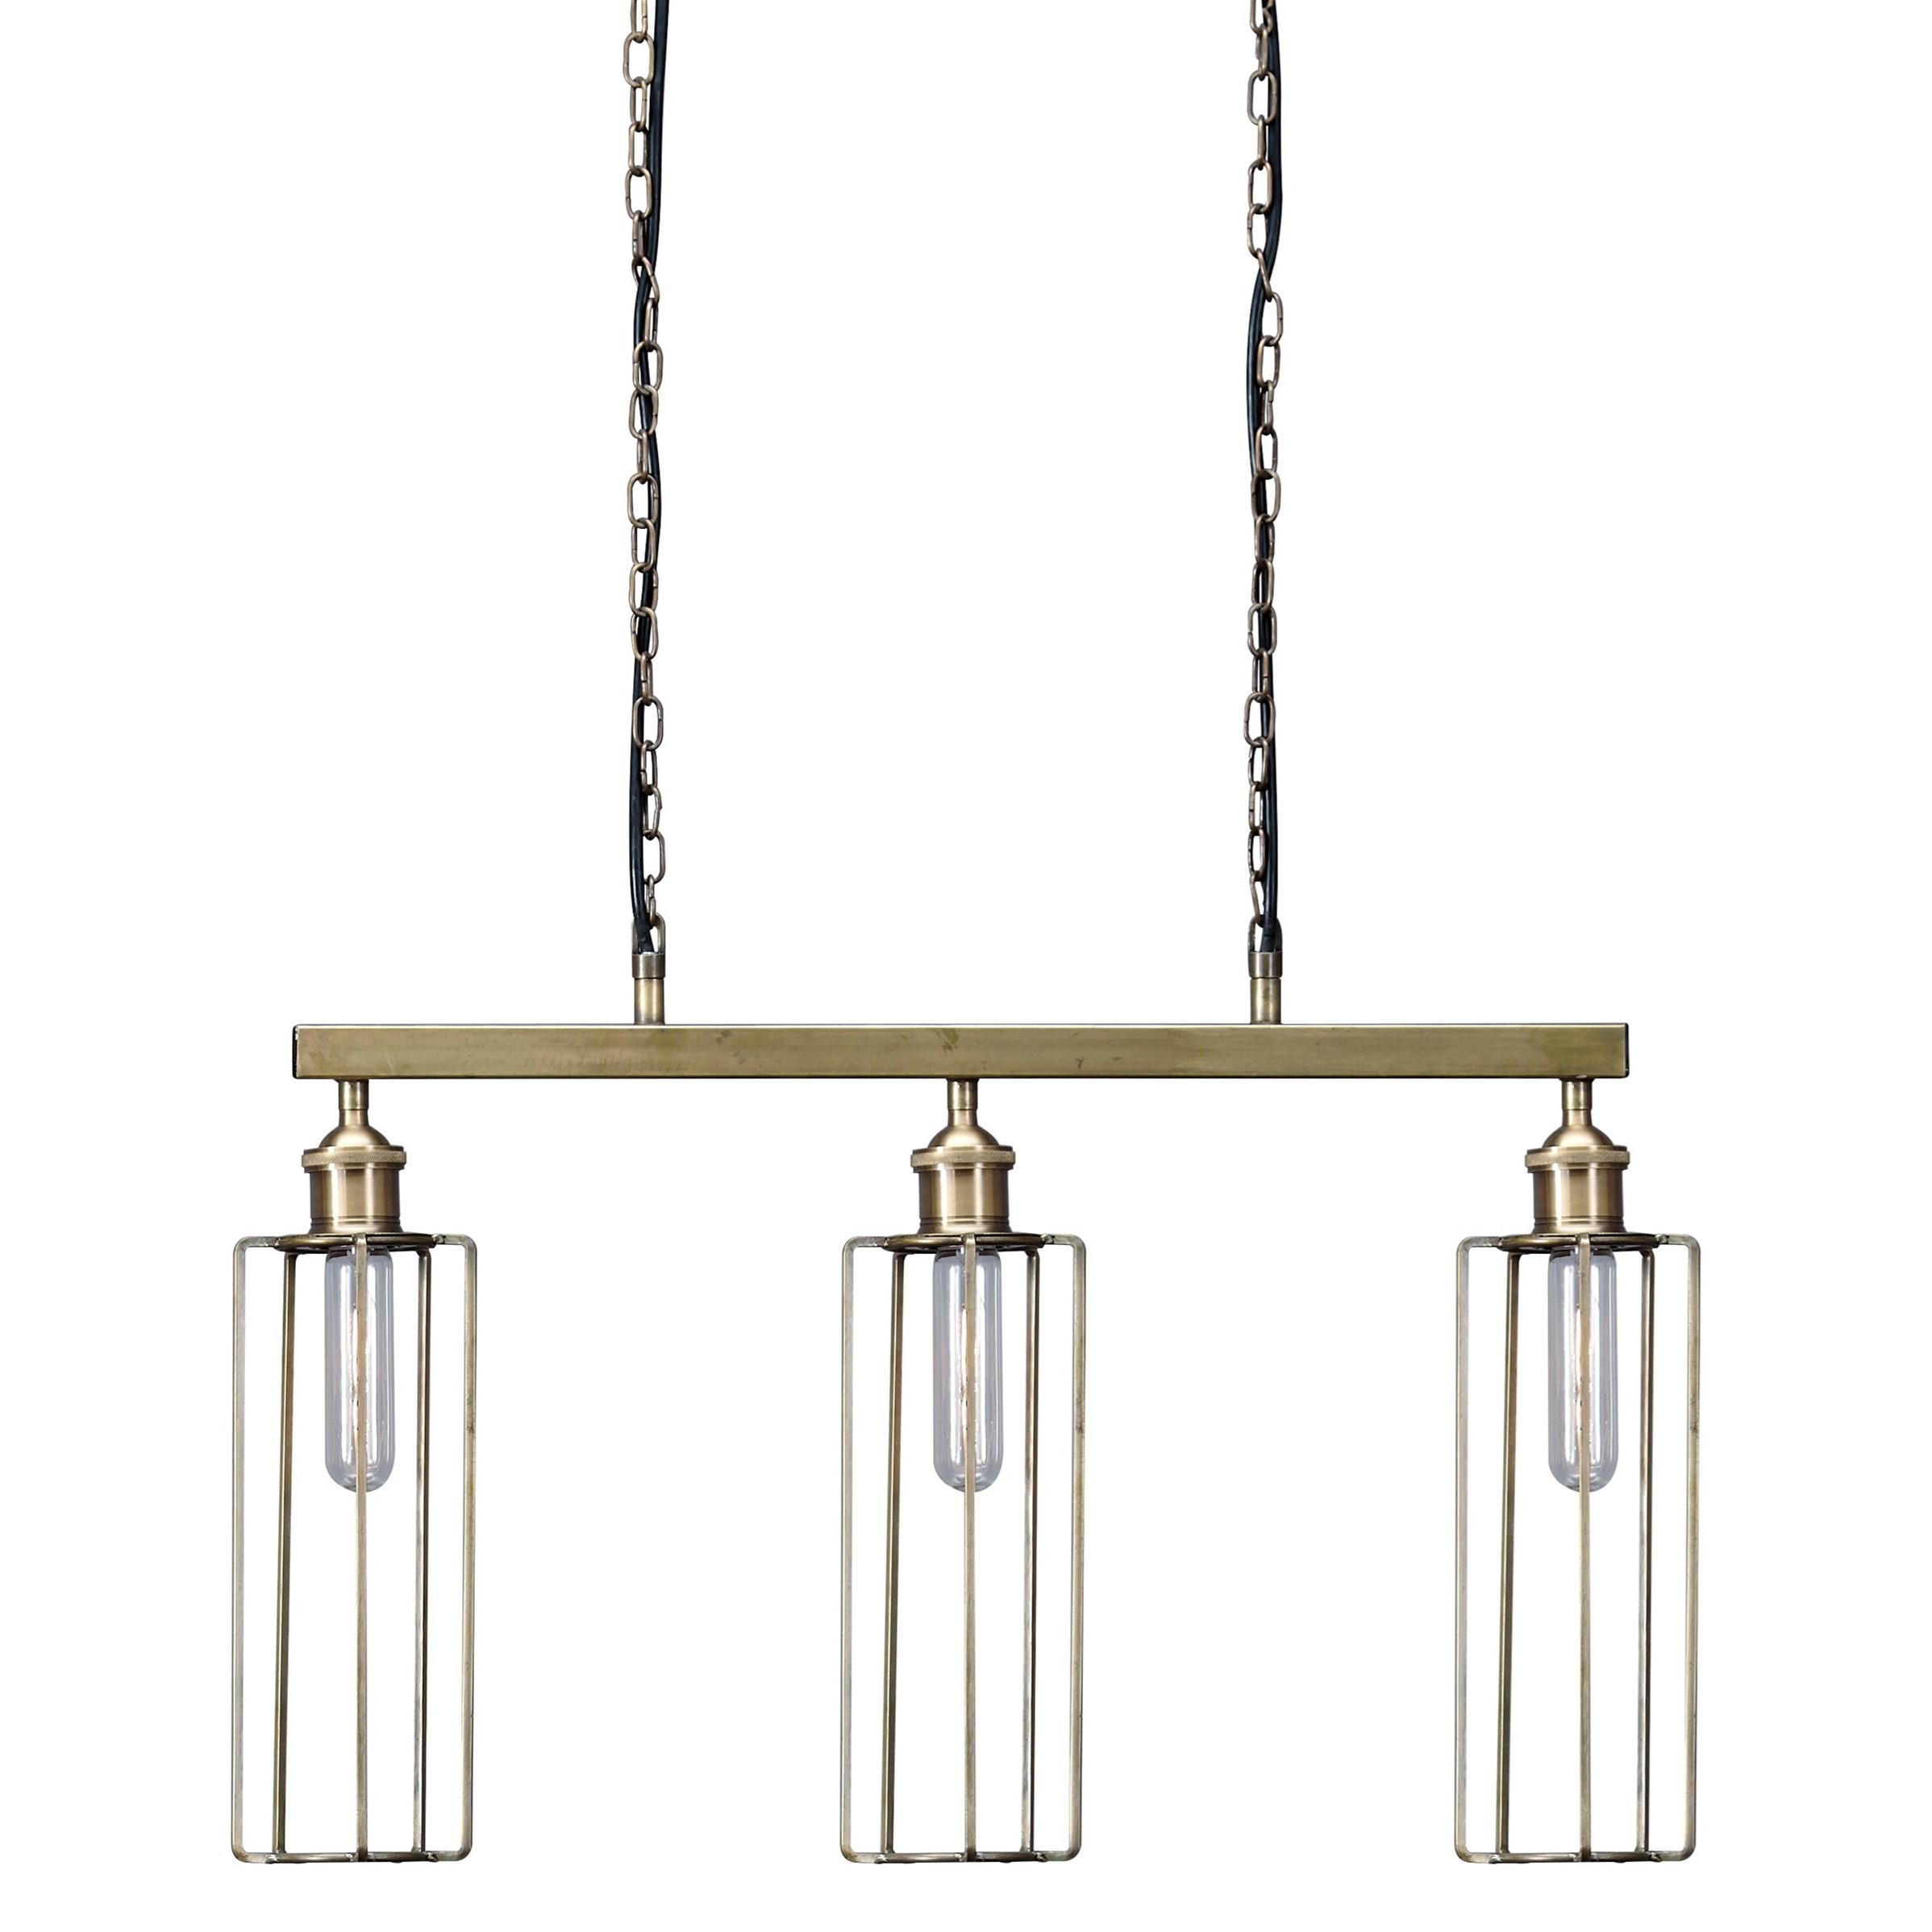 Signature Design by Ashley Pendant Lights Hilary Brass Finish Metal Pendant Light - Item Number: L000738